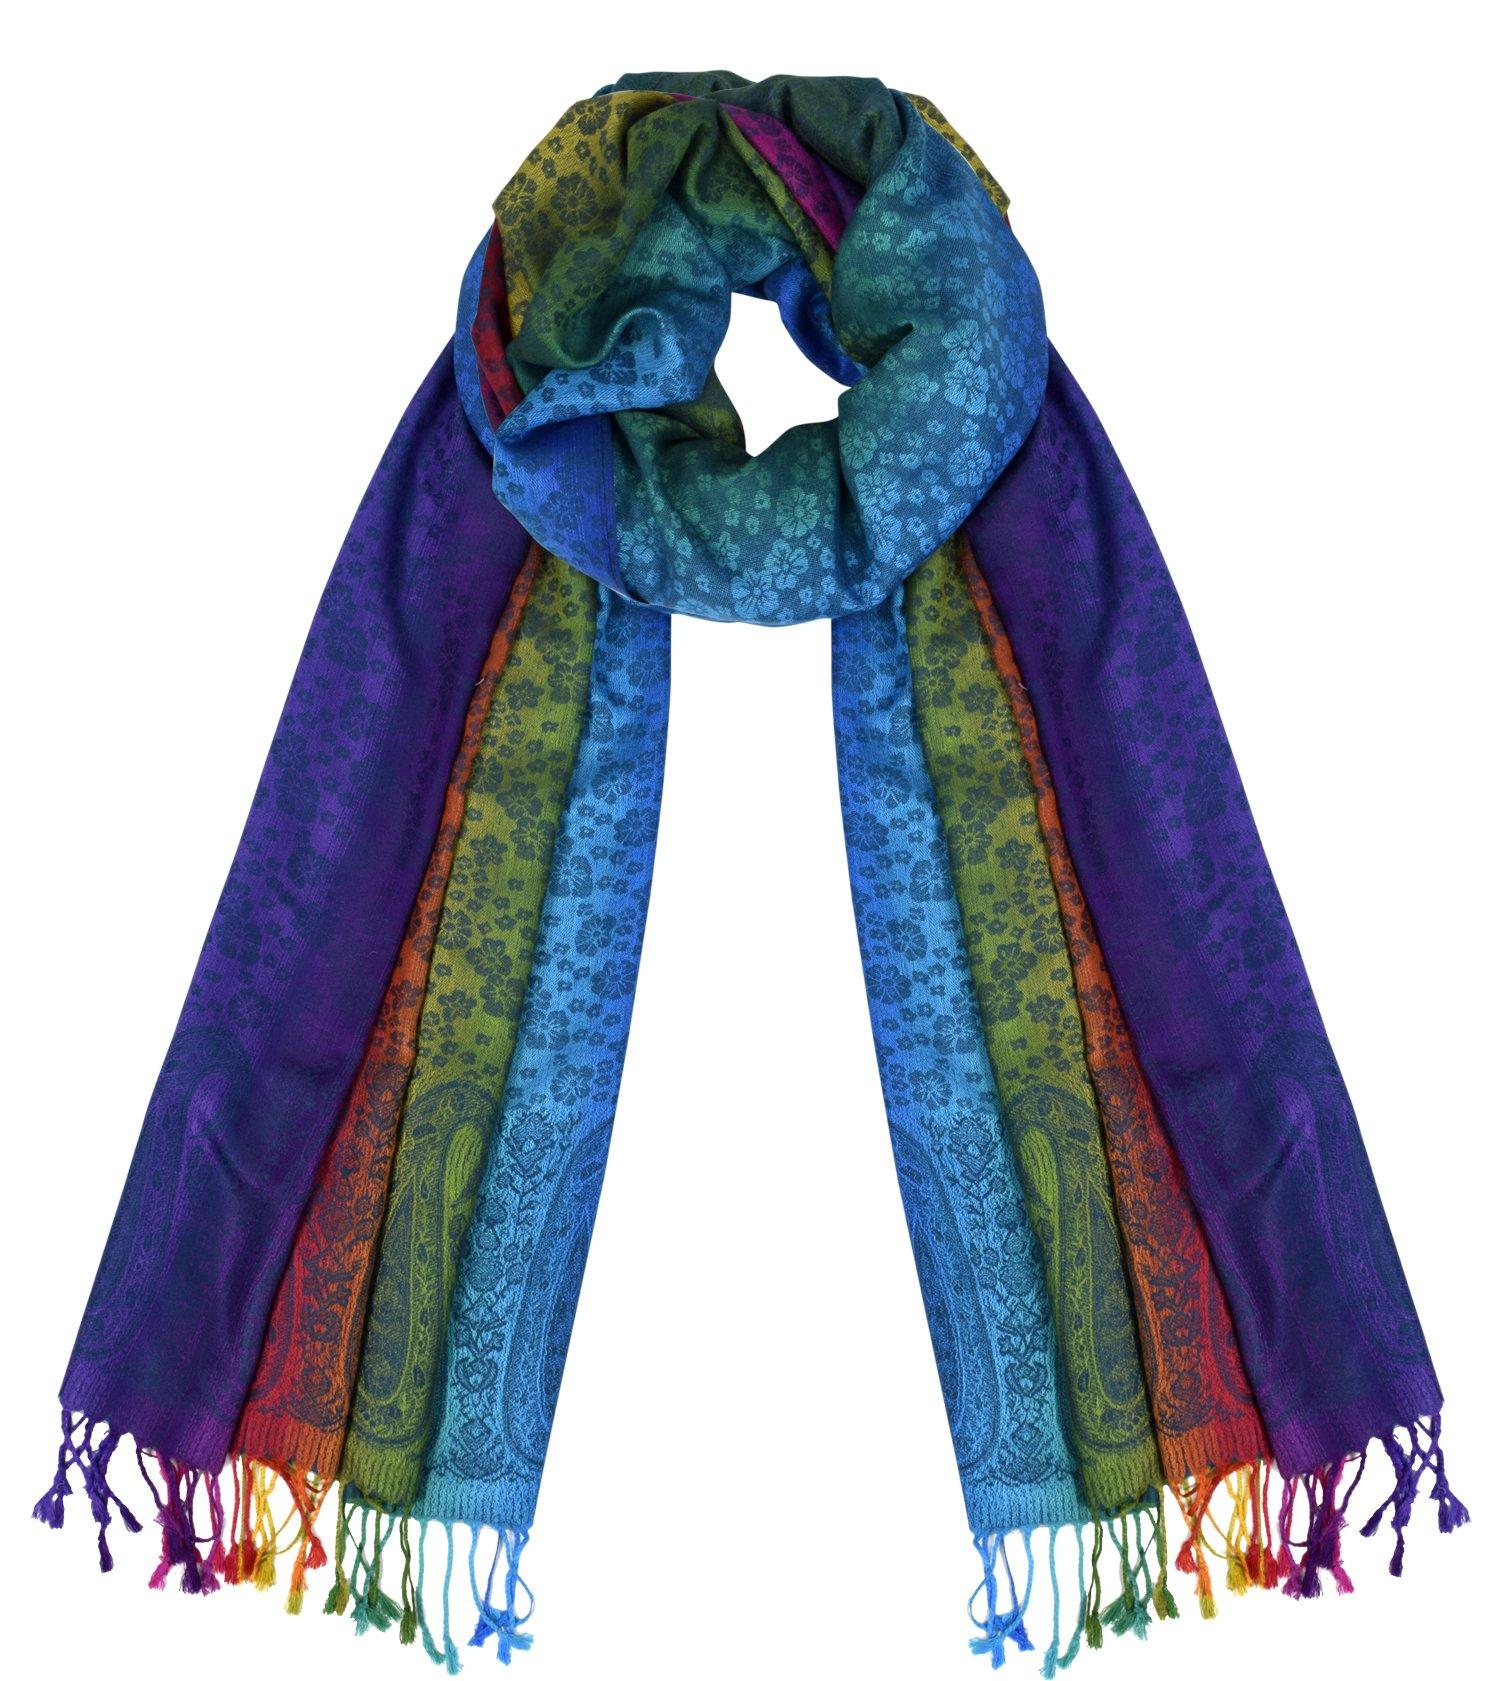 1e73ec127667 Peach Couture Rainbow Silky Tropical Hibiscus Floral Pashmina Wrap Shawl  Scarf (Floral Paisley Blue)